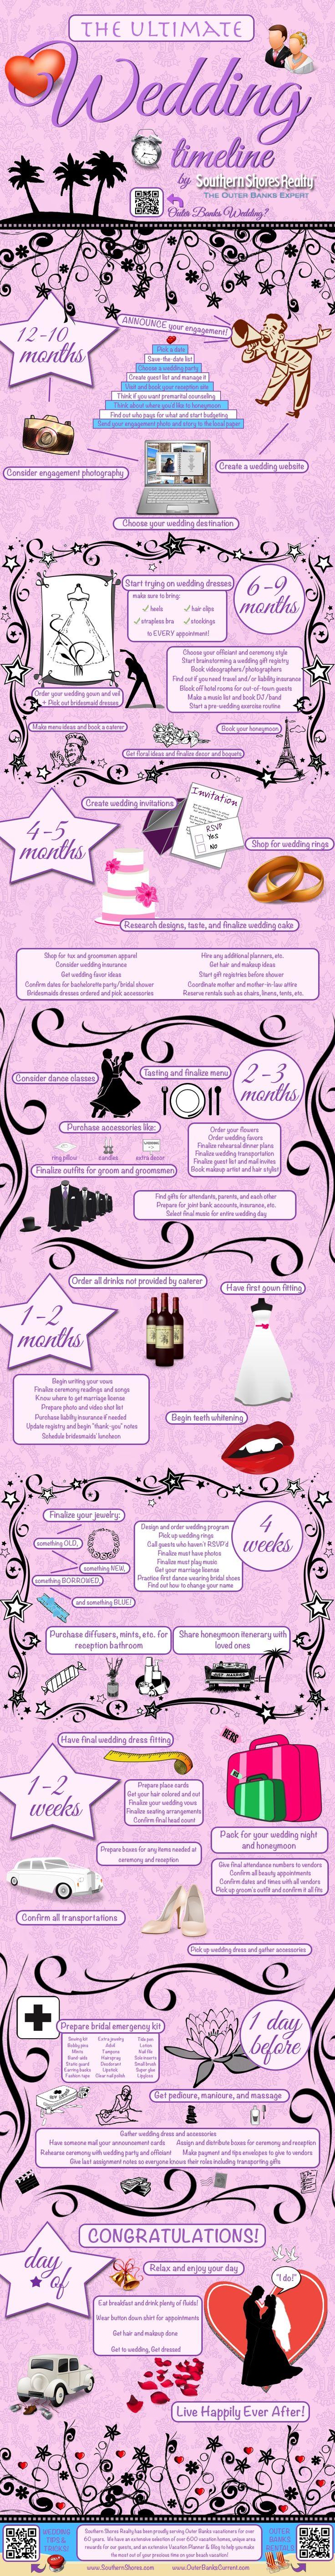 #Wedding Timeline Planner & Bride-to-be Checklist #Infographic!